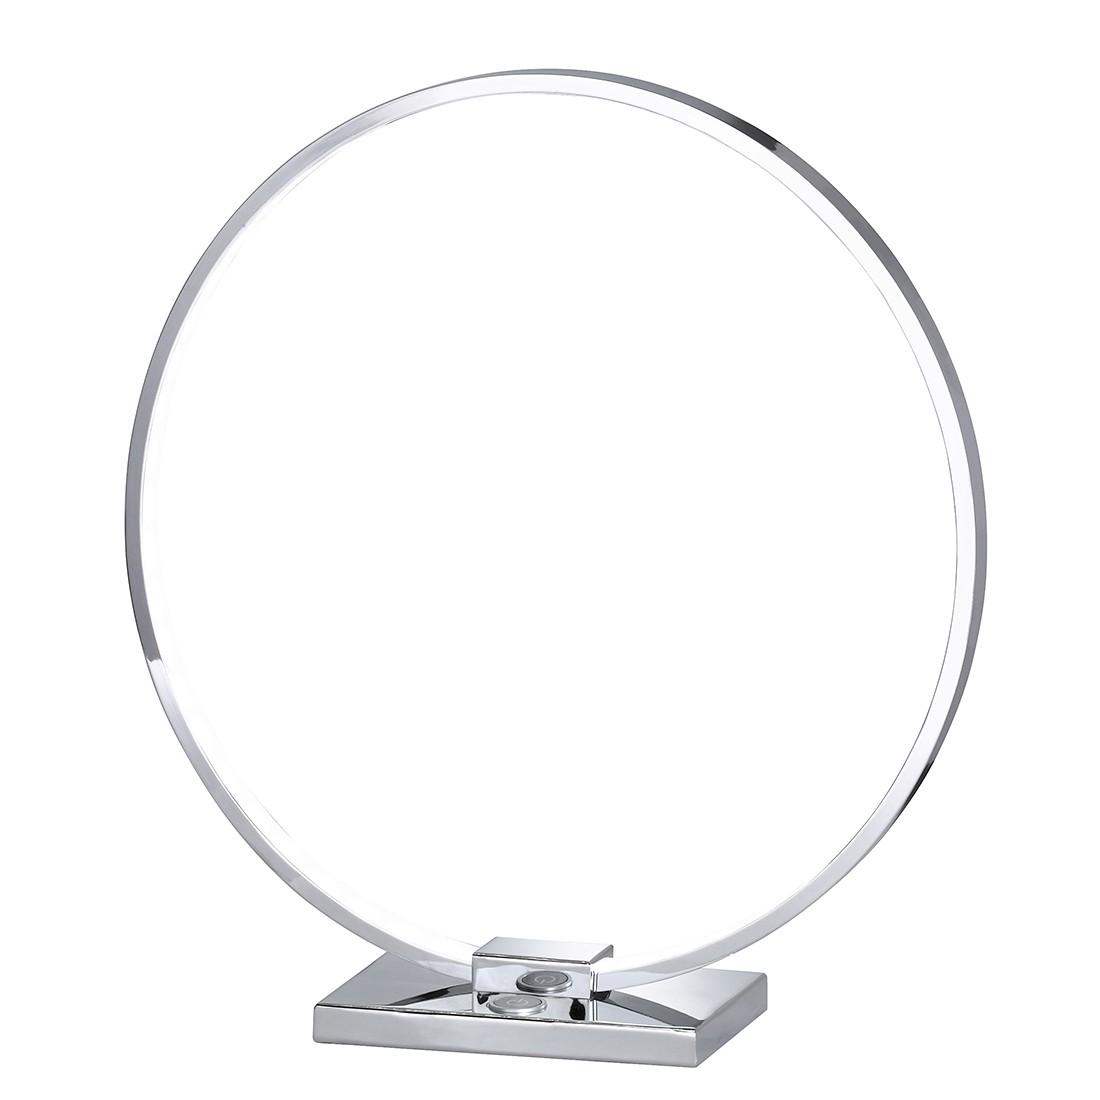 EEK A+, Tischleuchte STYLE – Metall – Silber – 1-flammig, Wofi günstig